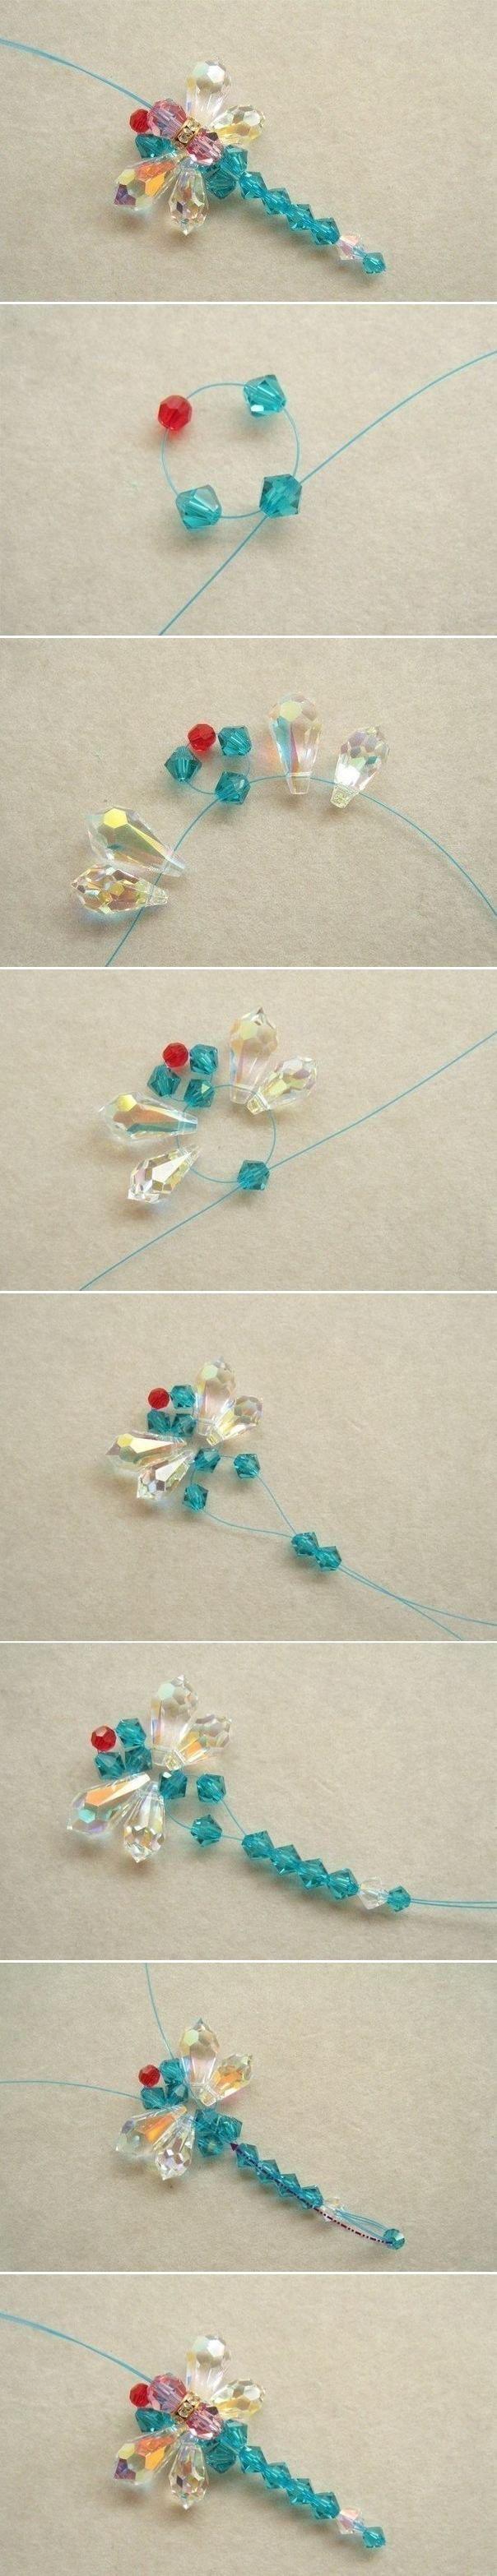 gargant.: libélula de cristales. tutorial                                                                                                                                                                                 Más